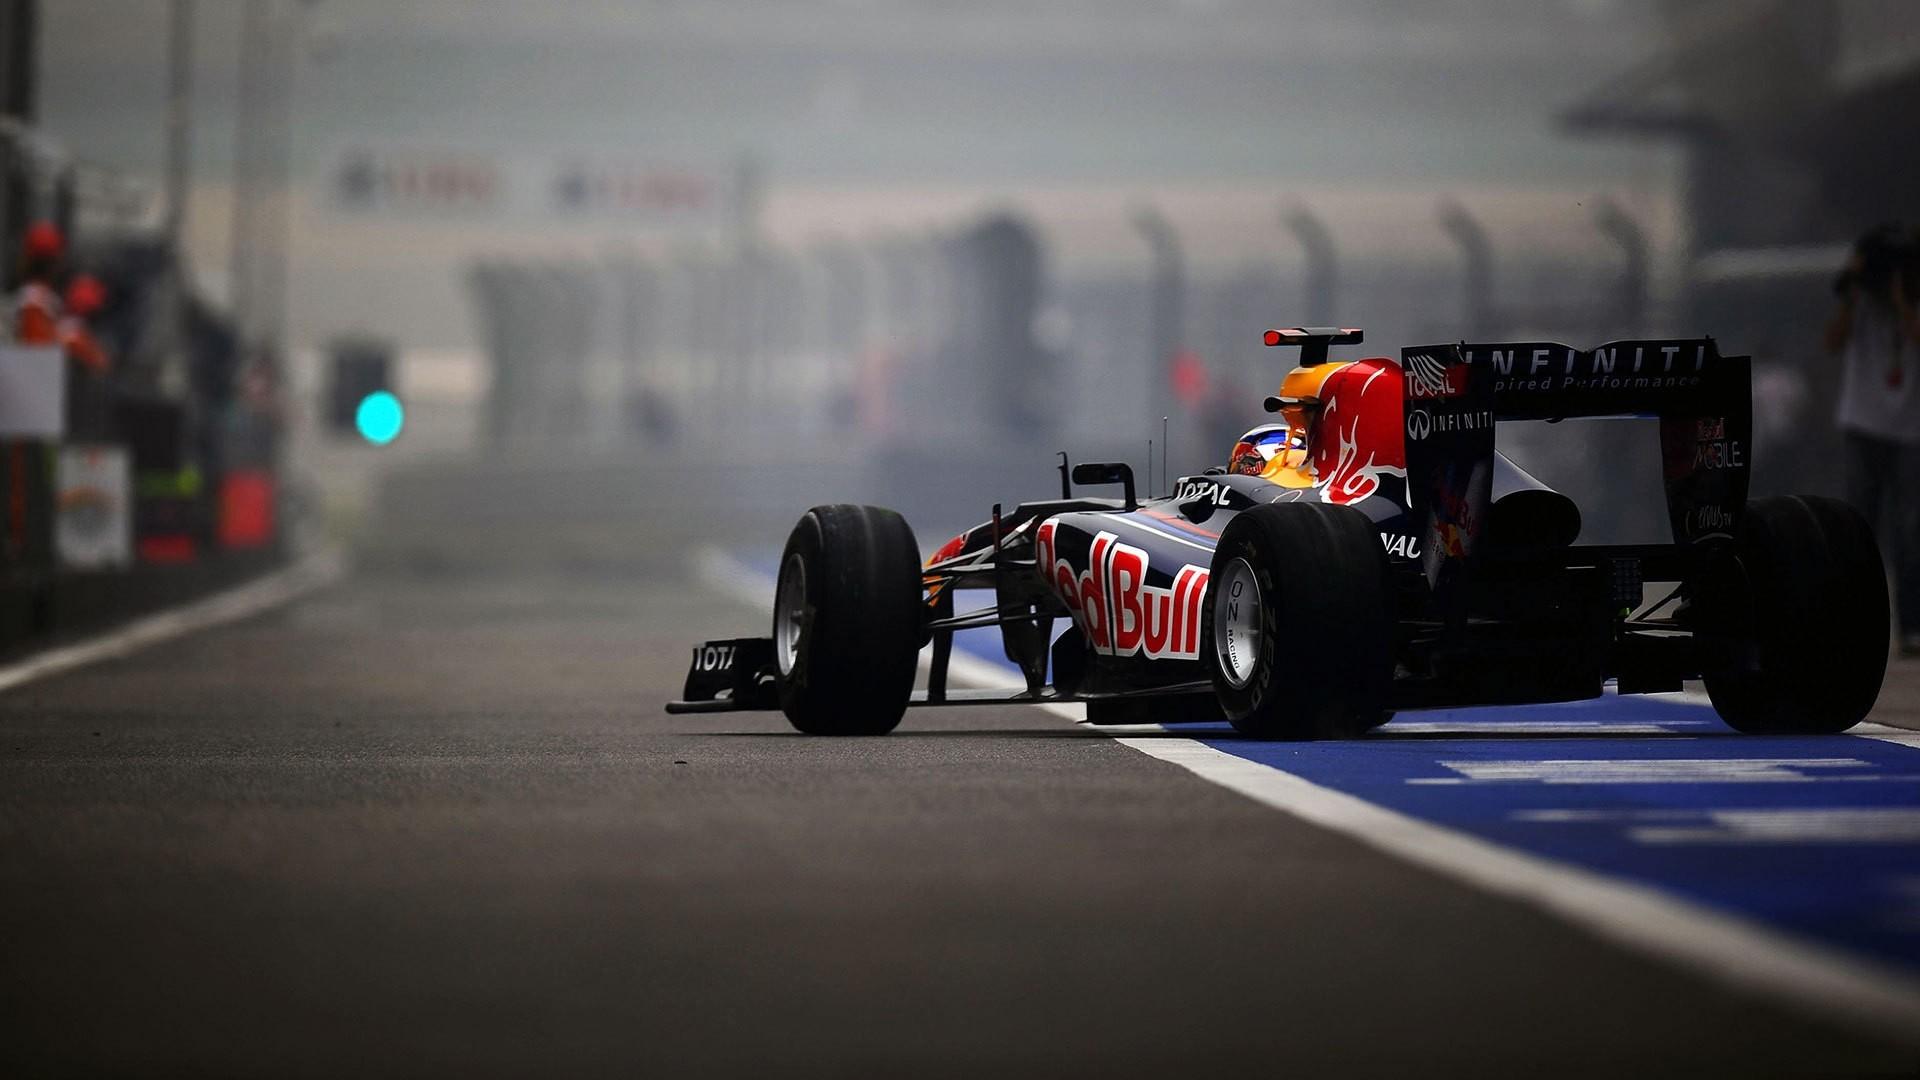 General 1920x1080 Red Bull Formula 1 car racing sports car sports Red Bull Racing vehicle sport